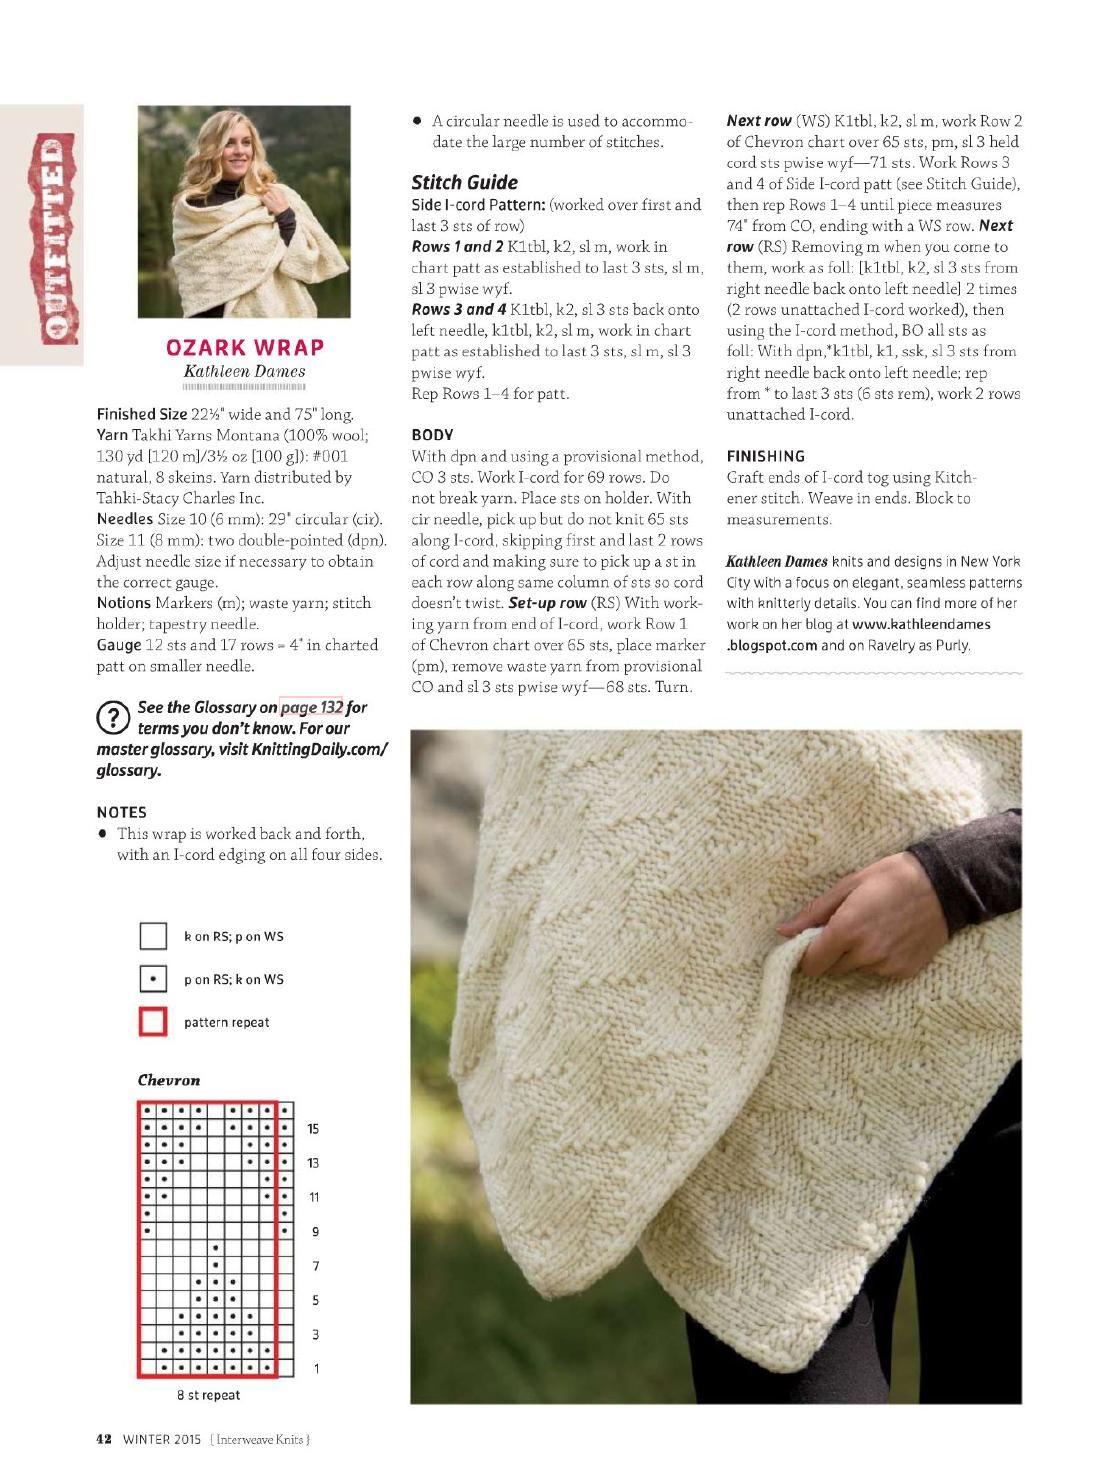 ISSUU - Interweave knits 2015 winter by Tatiana Sorokina